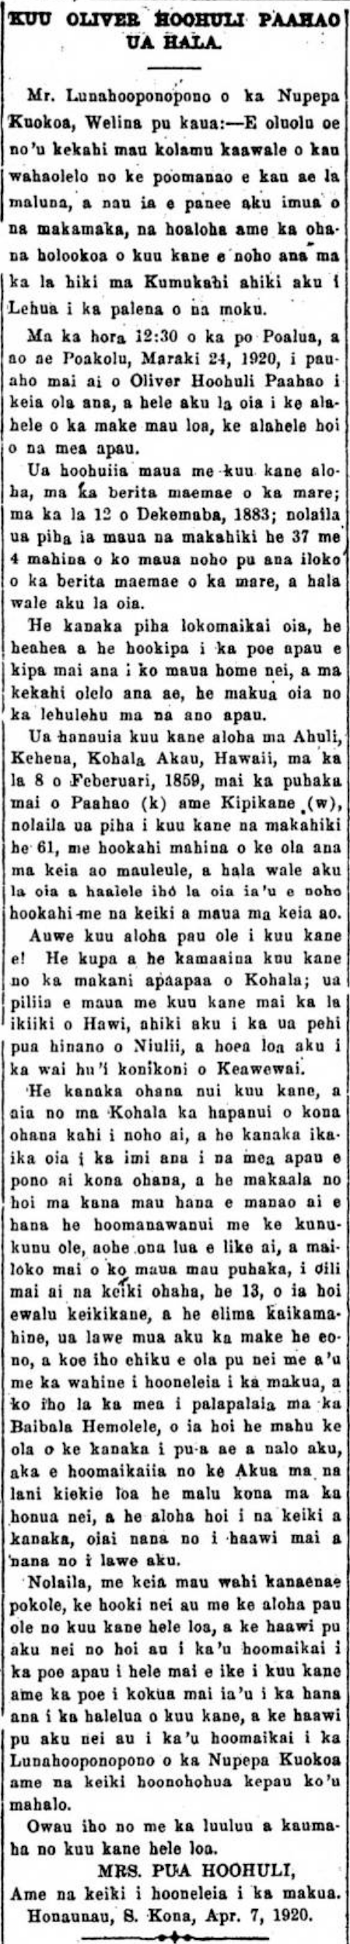 Kuokoa_4_30_1920_3